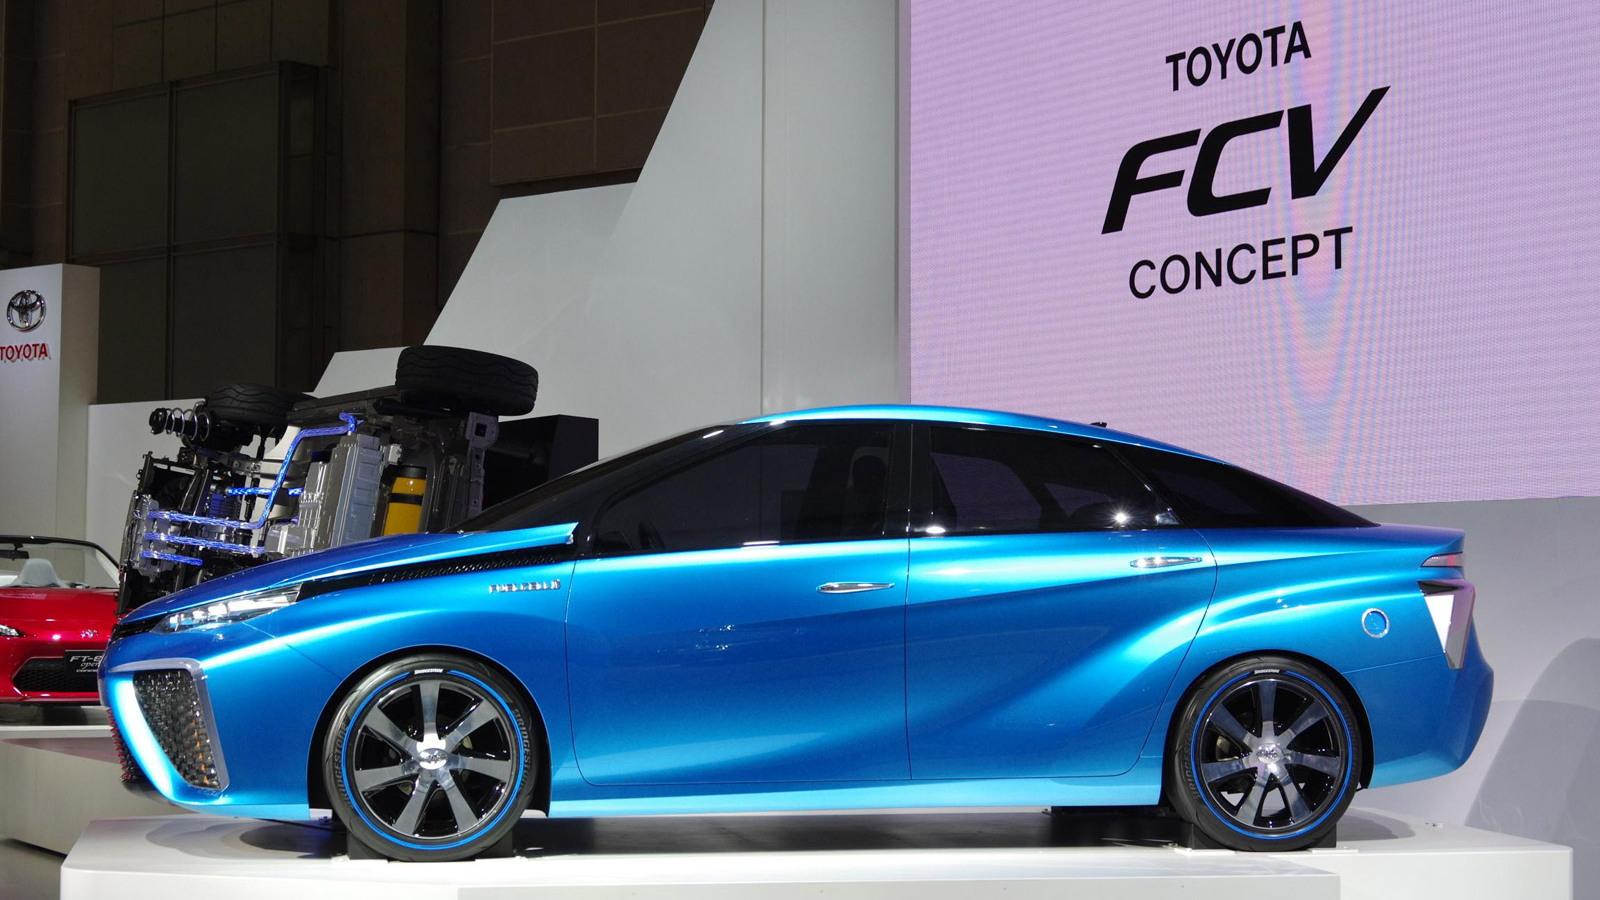 Toyota FCV concept, 2013 Tokyo Motor Show